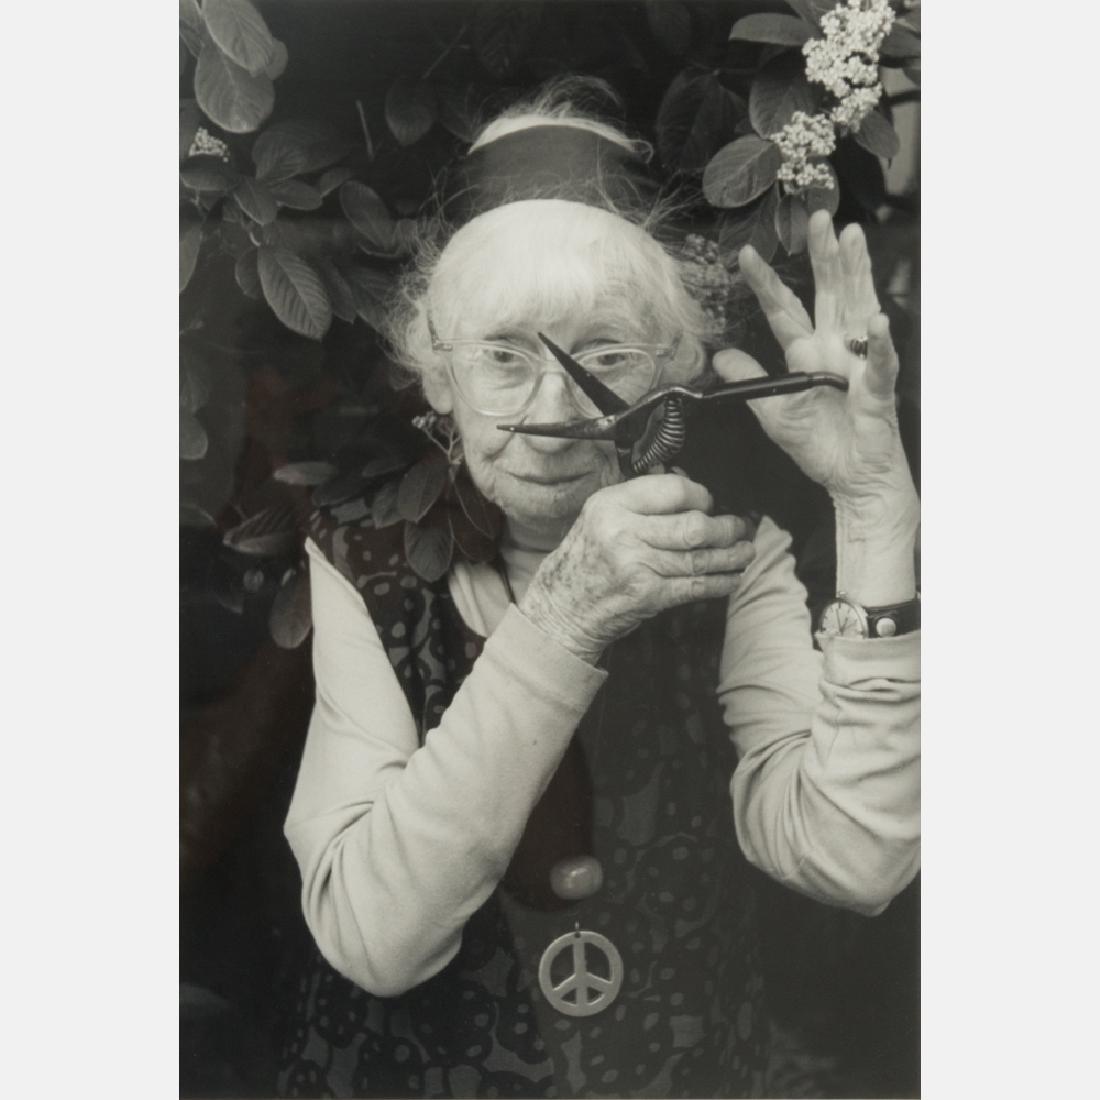 Abe Frajndlich (b. 1946) Imogen Cunningham, San